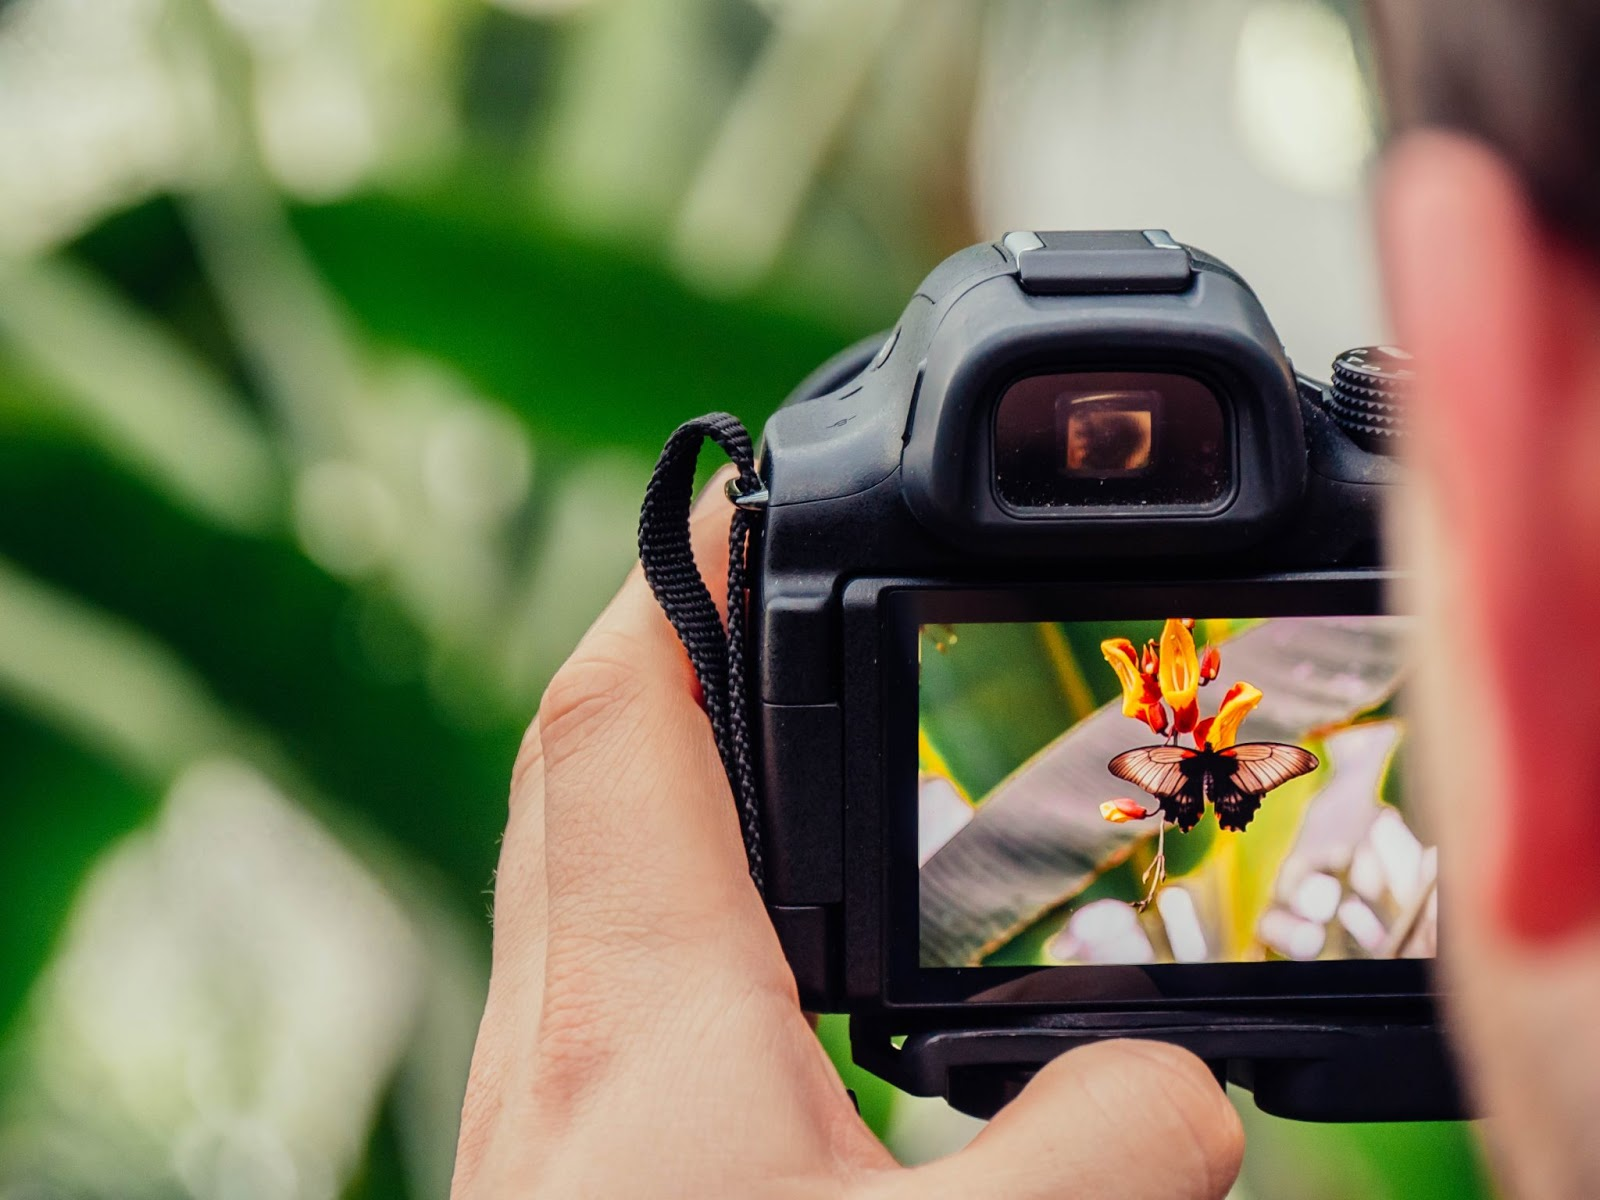 Cara Memegang Kamera